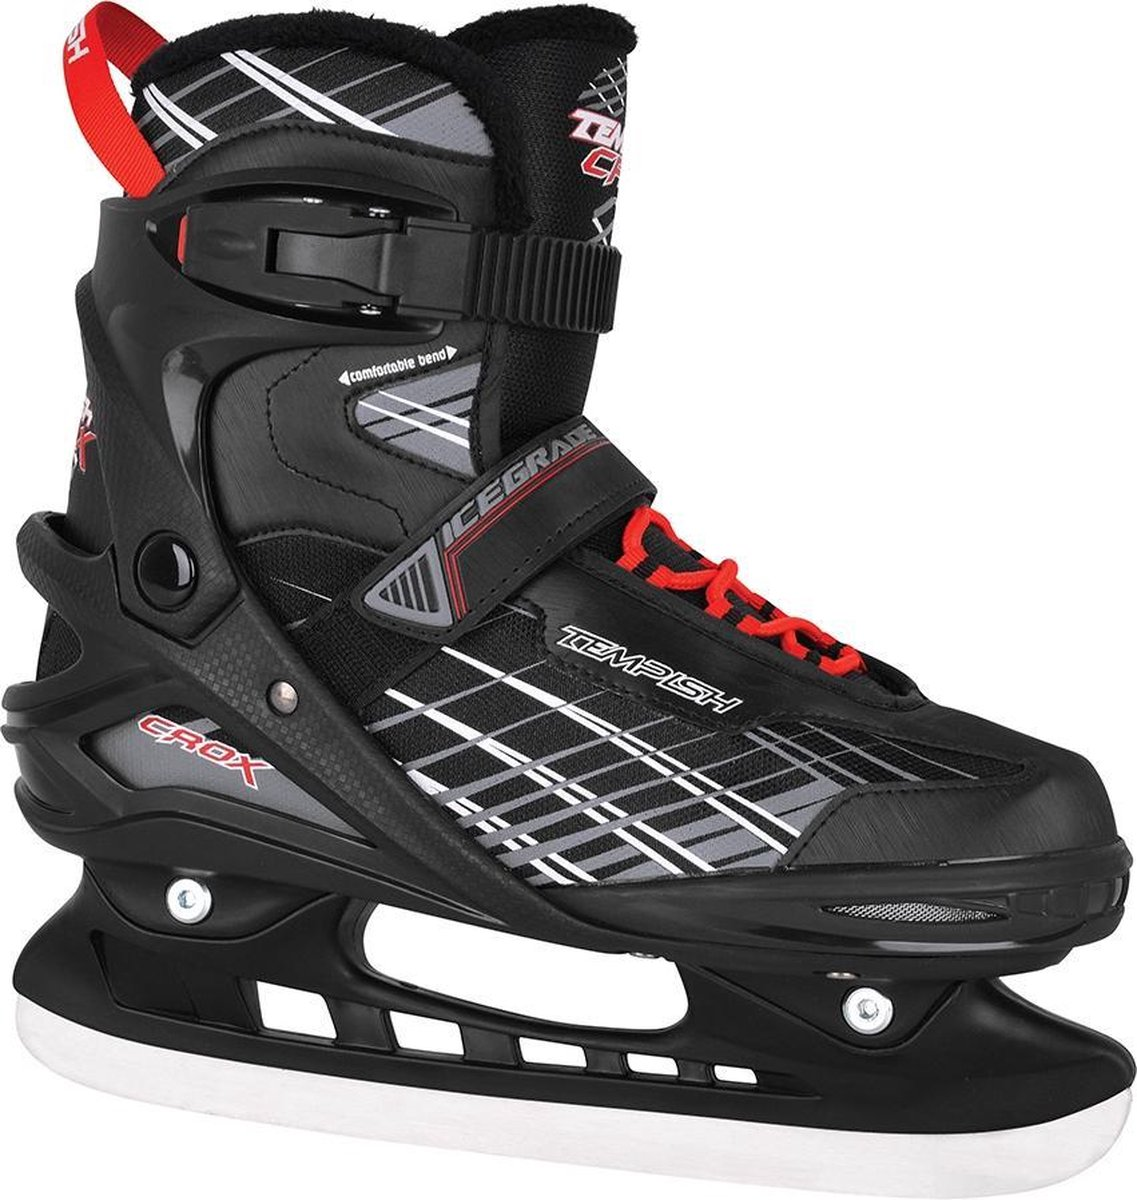 Tempish IJshockeyschaatsen CROX Zwart/Rood 40